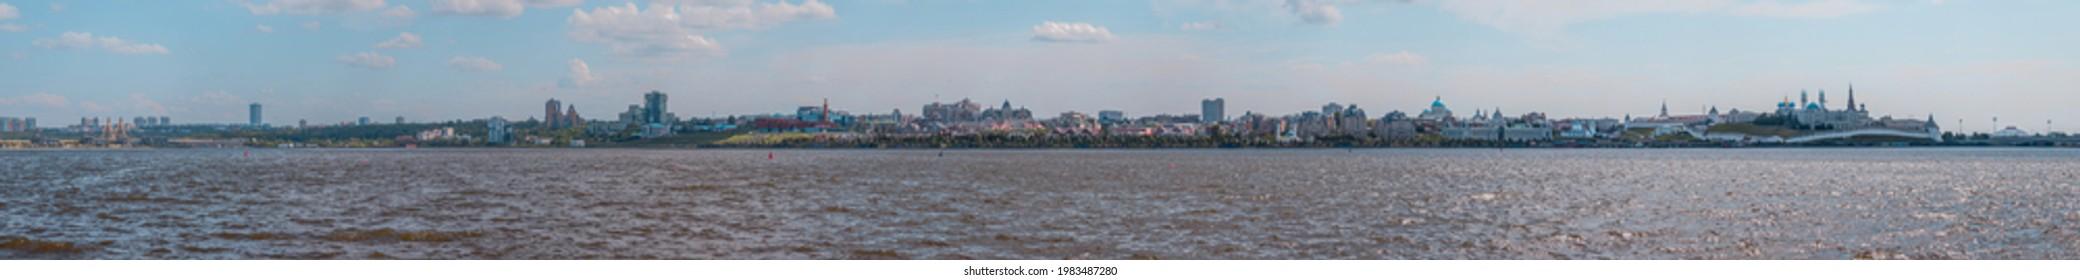 "May 2021. Panorama view of Kazan city. View from ""Kazan wedding ovservation area""."